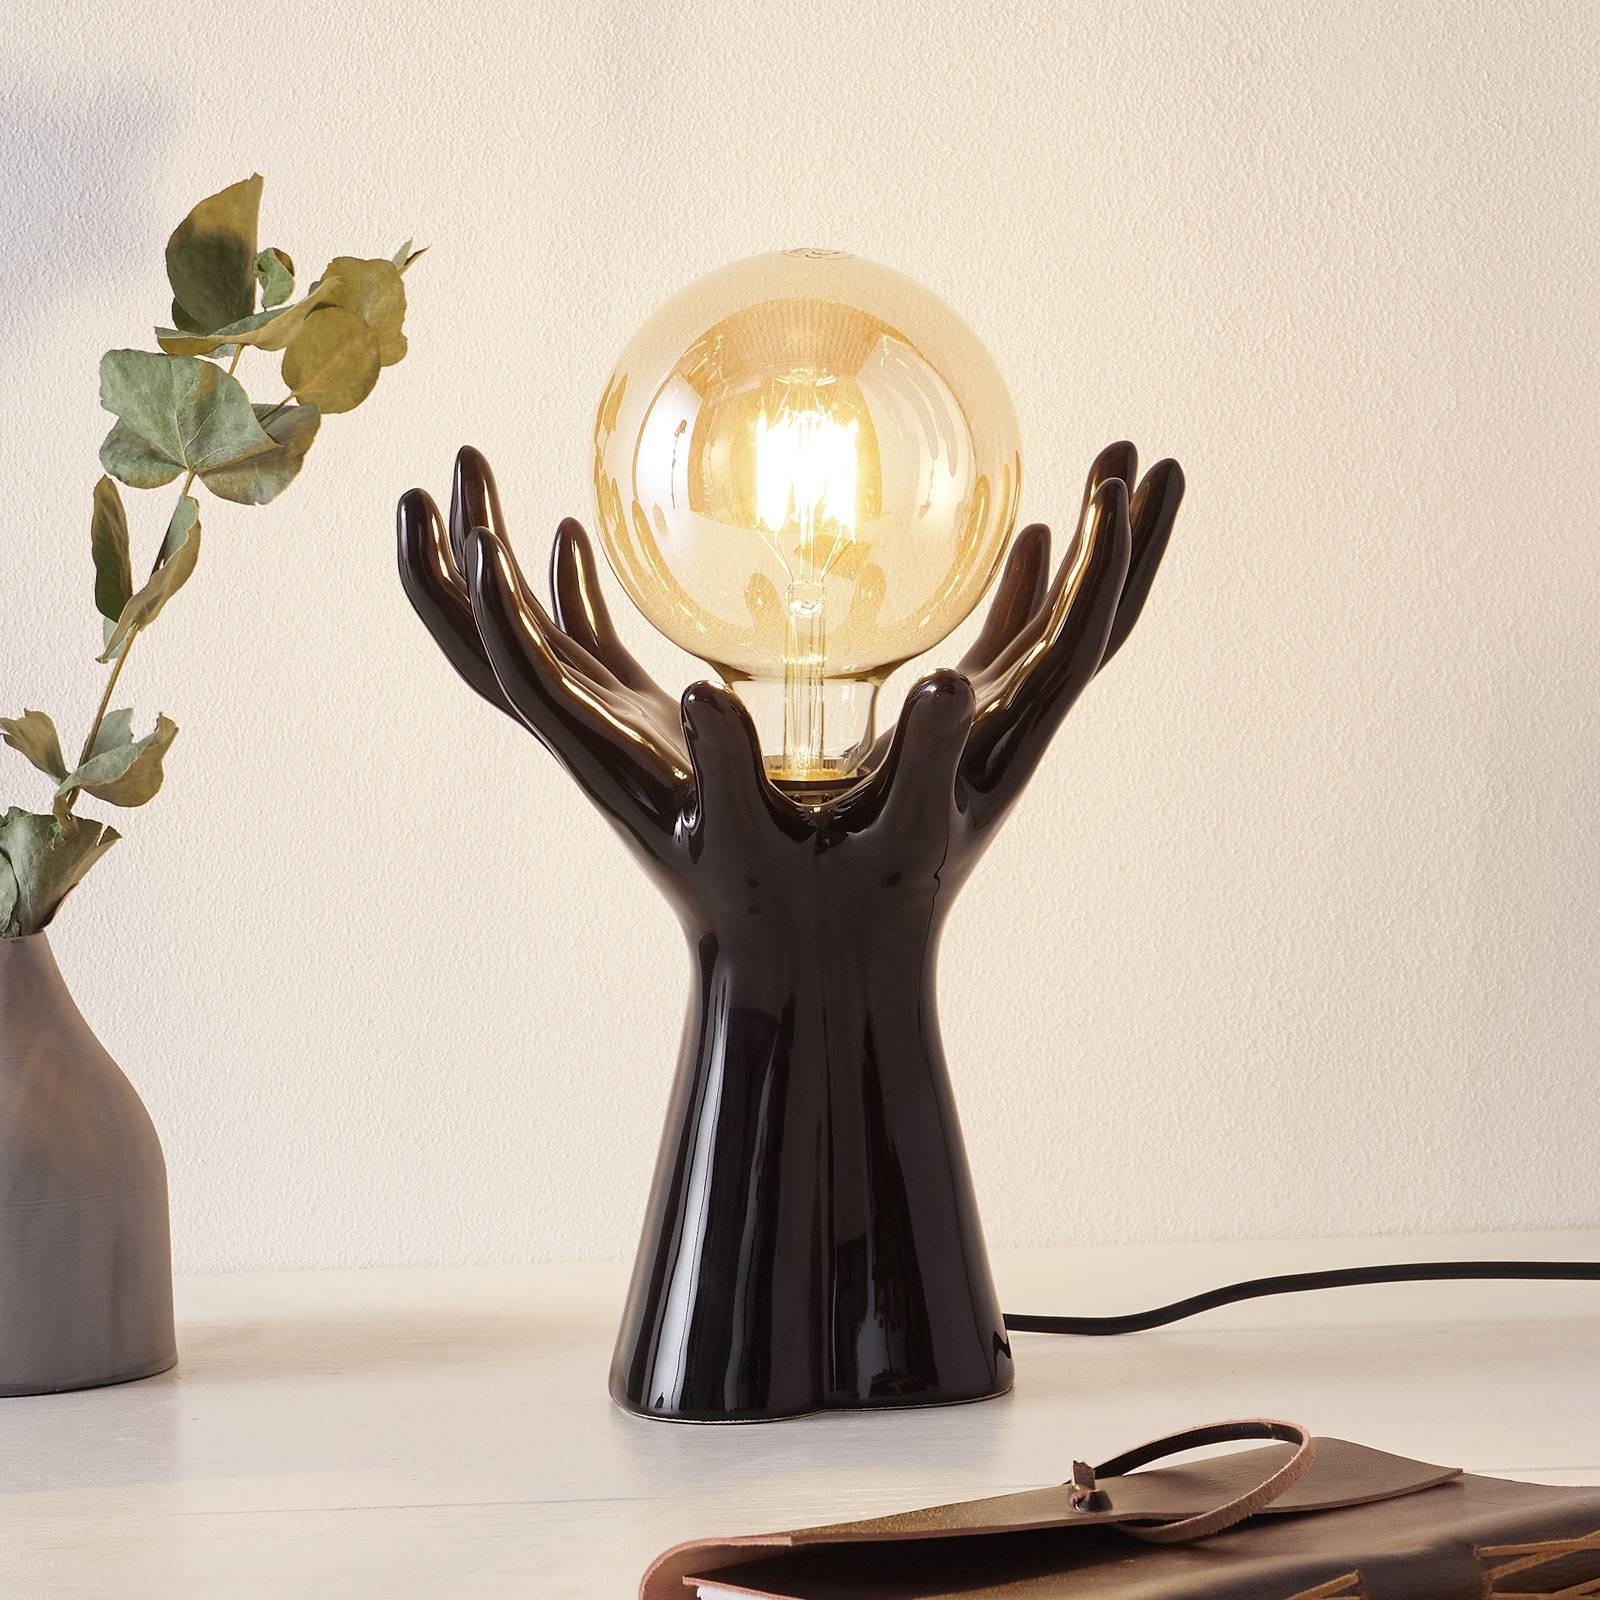 Keramisk bordlampe L183 NR, svart, blank